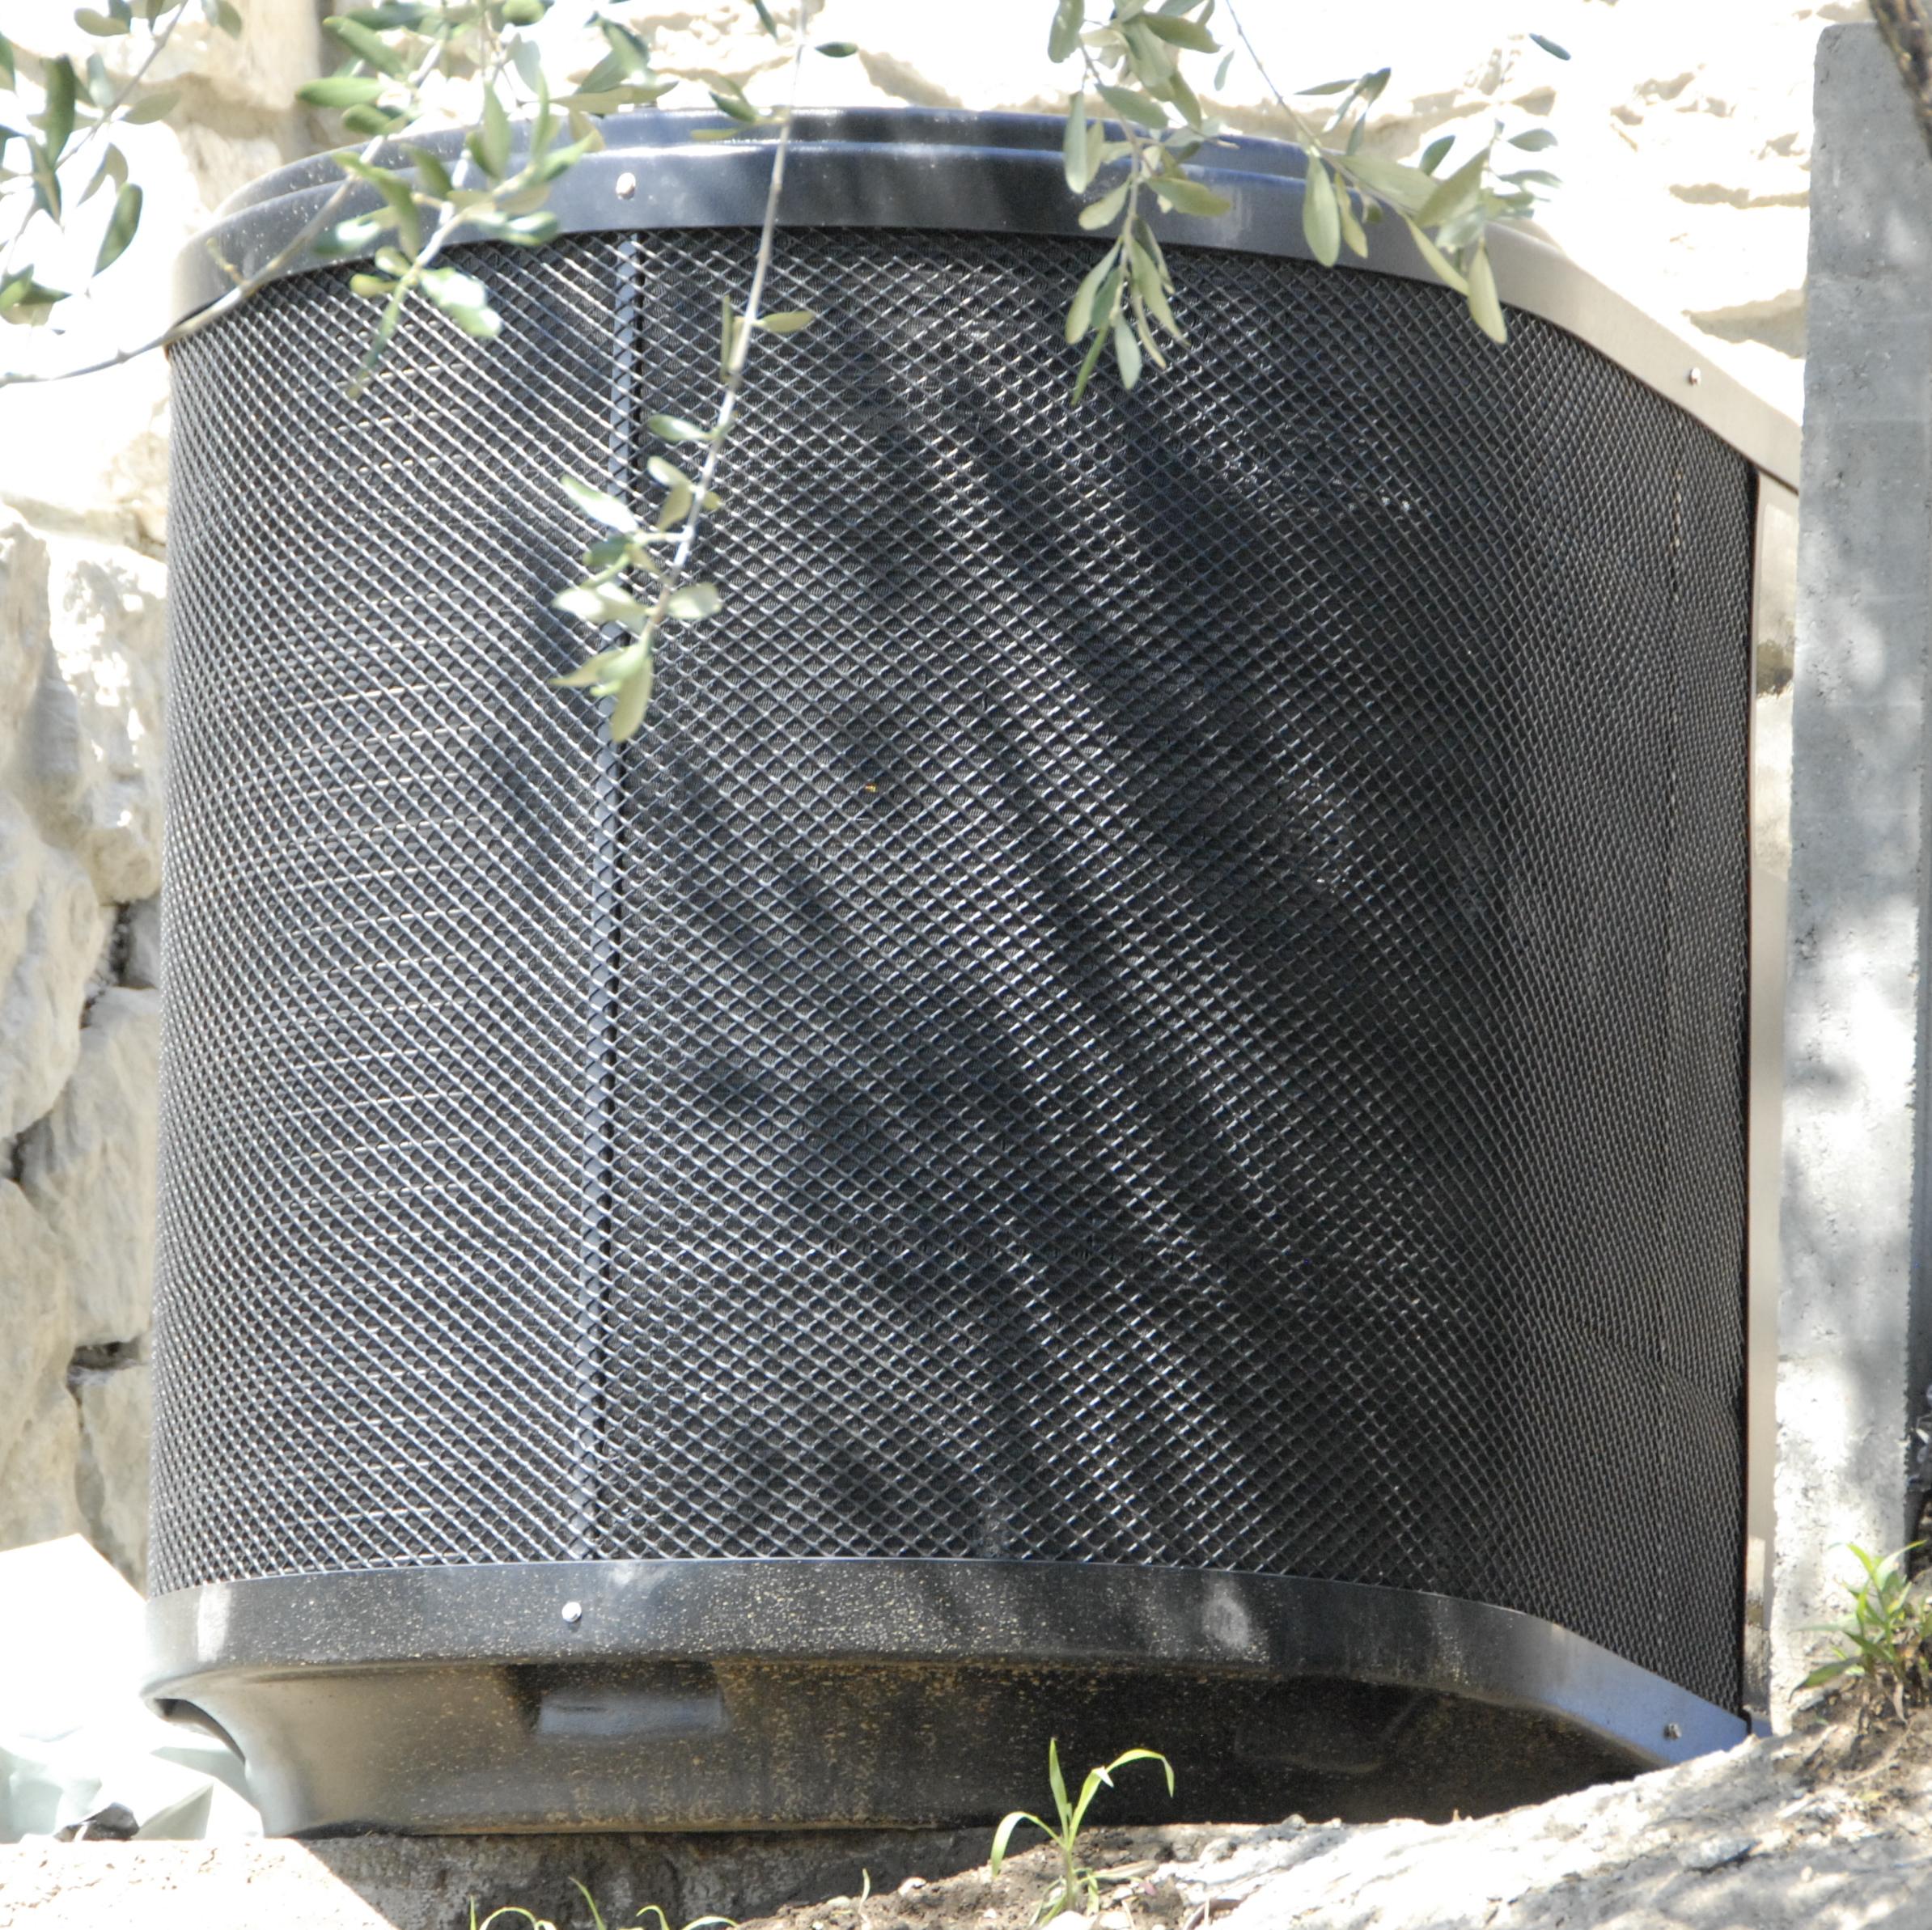 2 Luft-Wärmepumpe